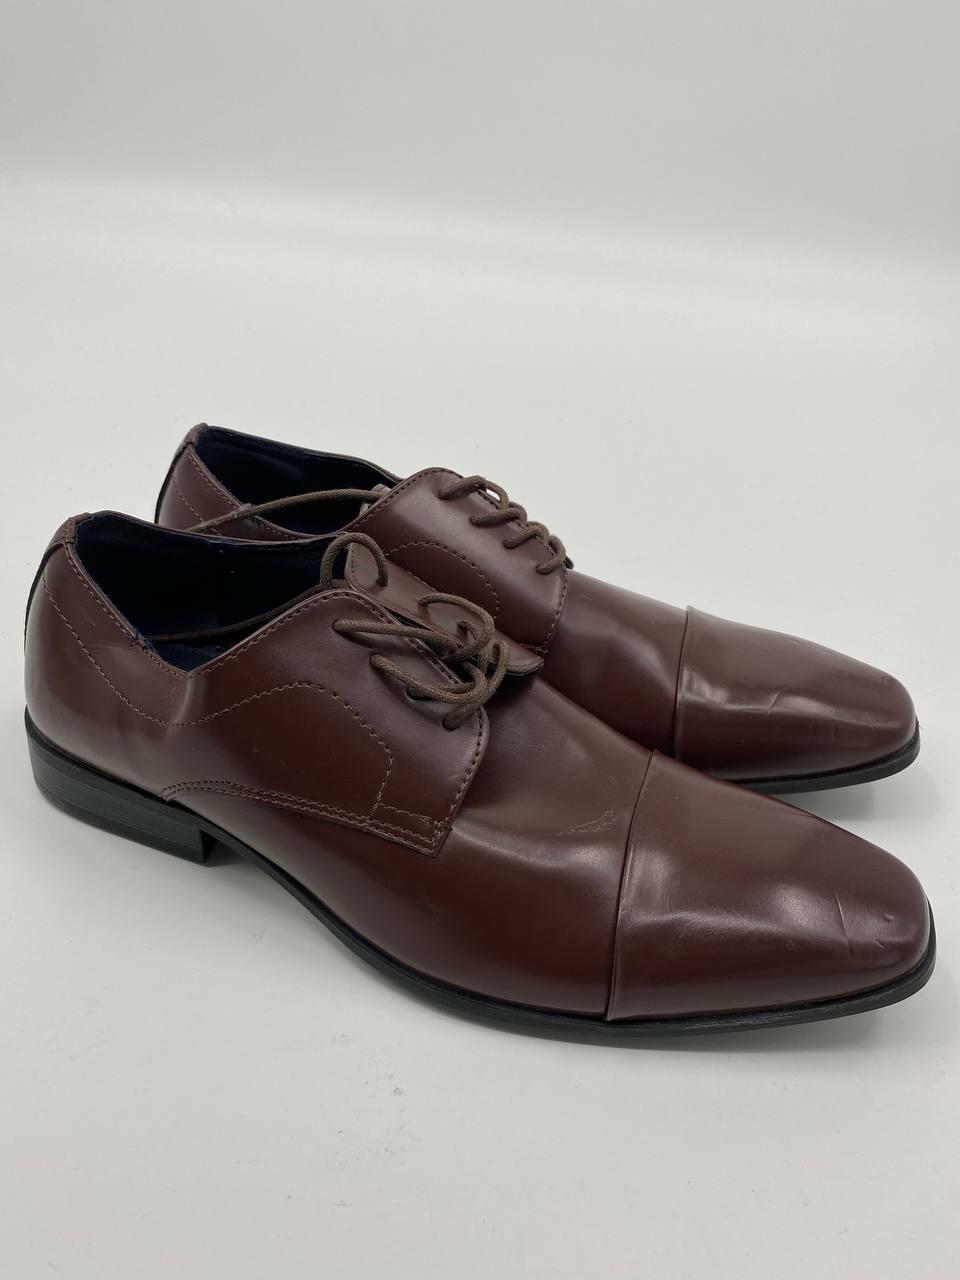 New Joseph Abboud mens Oxfords brown burgundy leather Sz 9.5 cap toe A-76